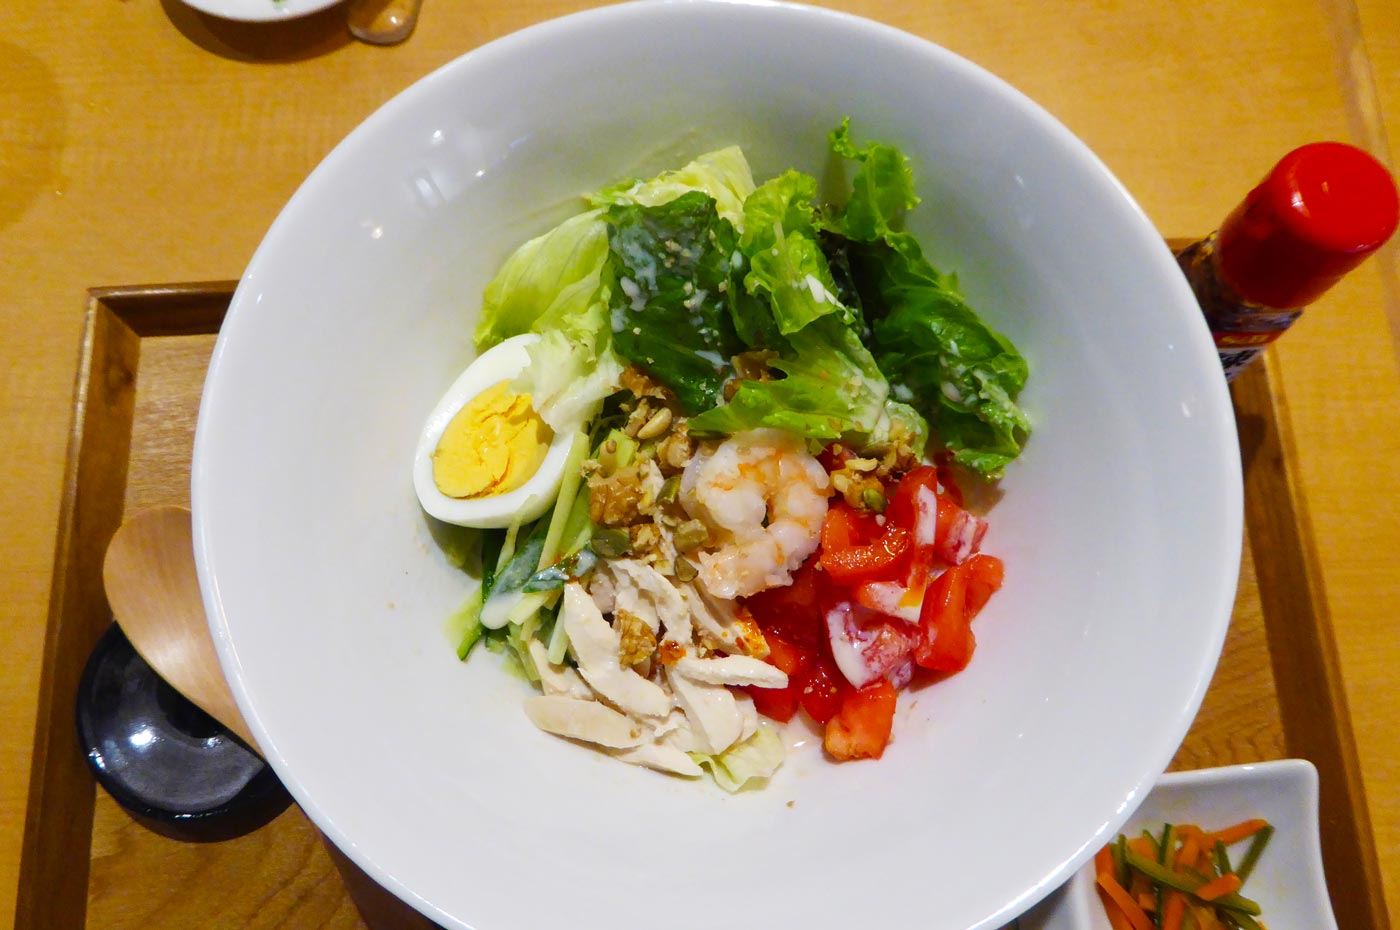 ICHIEMONの豆乳仕立てのサラダ米麺